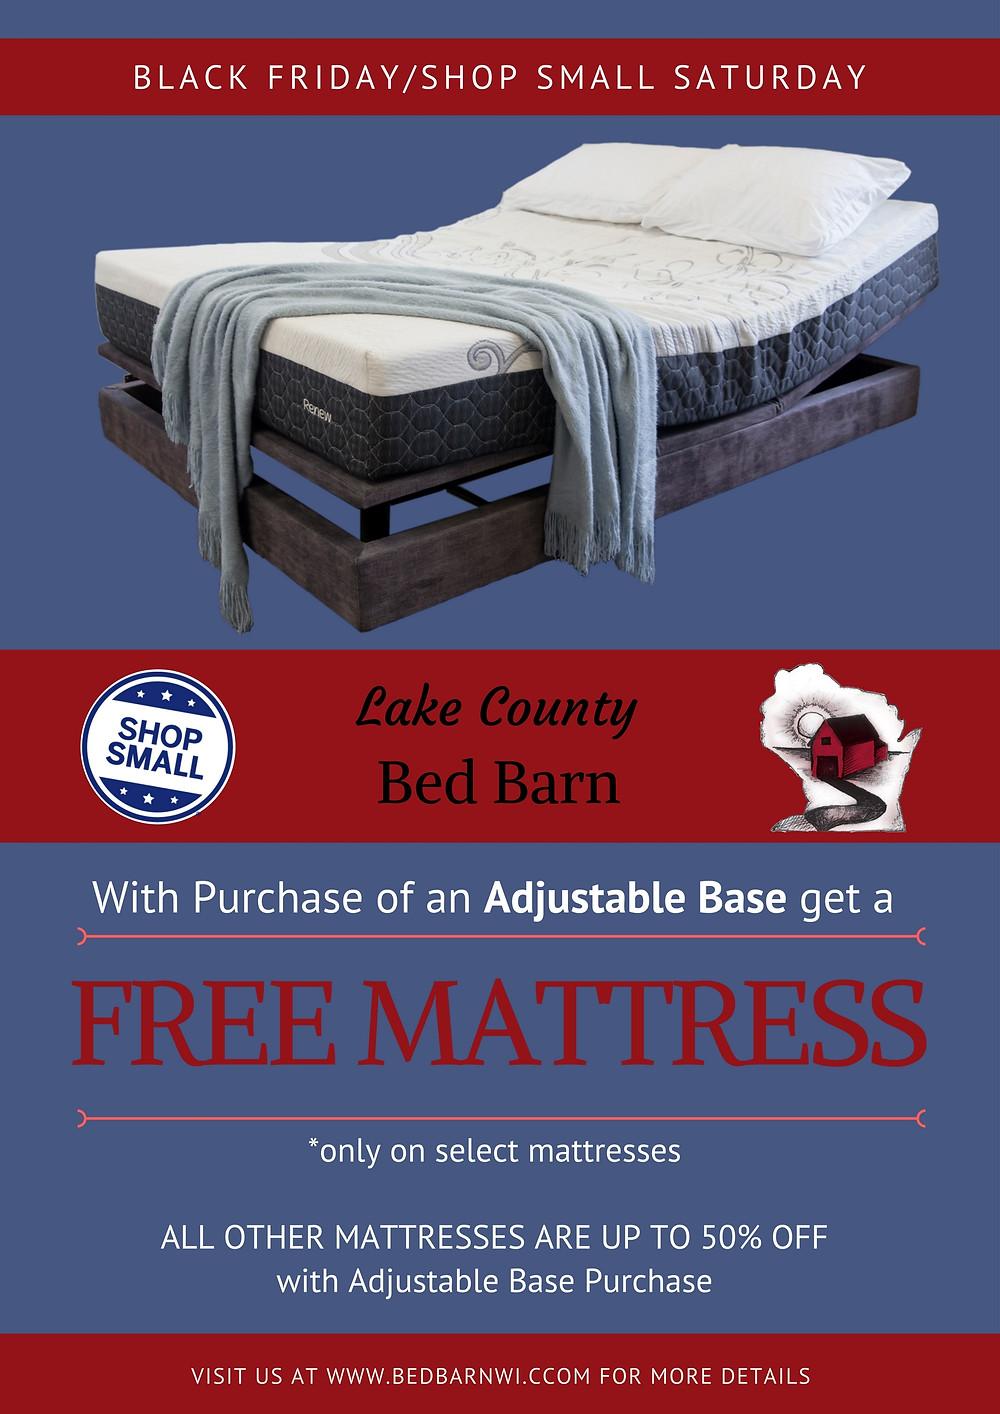 Free Mattress Poster